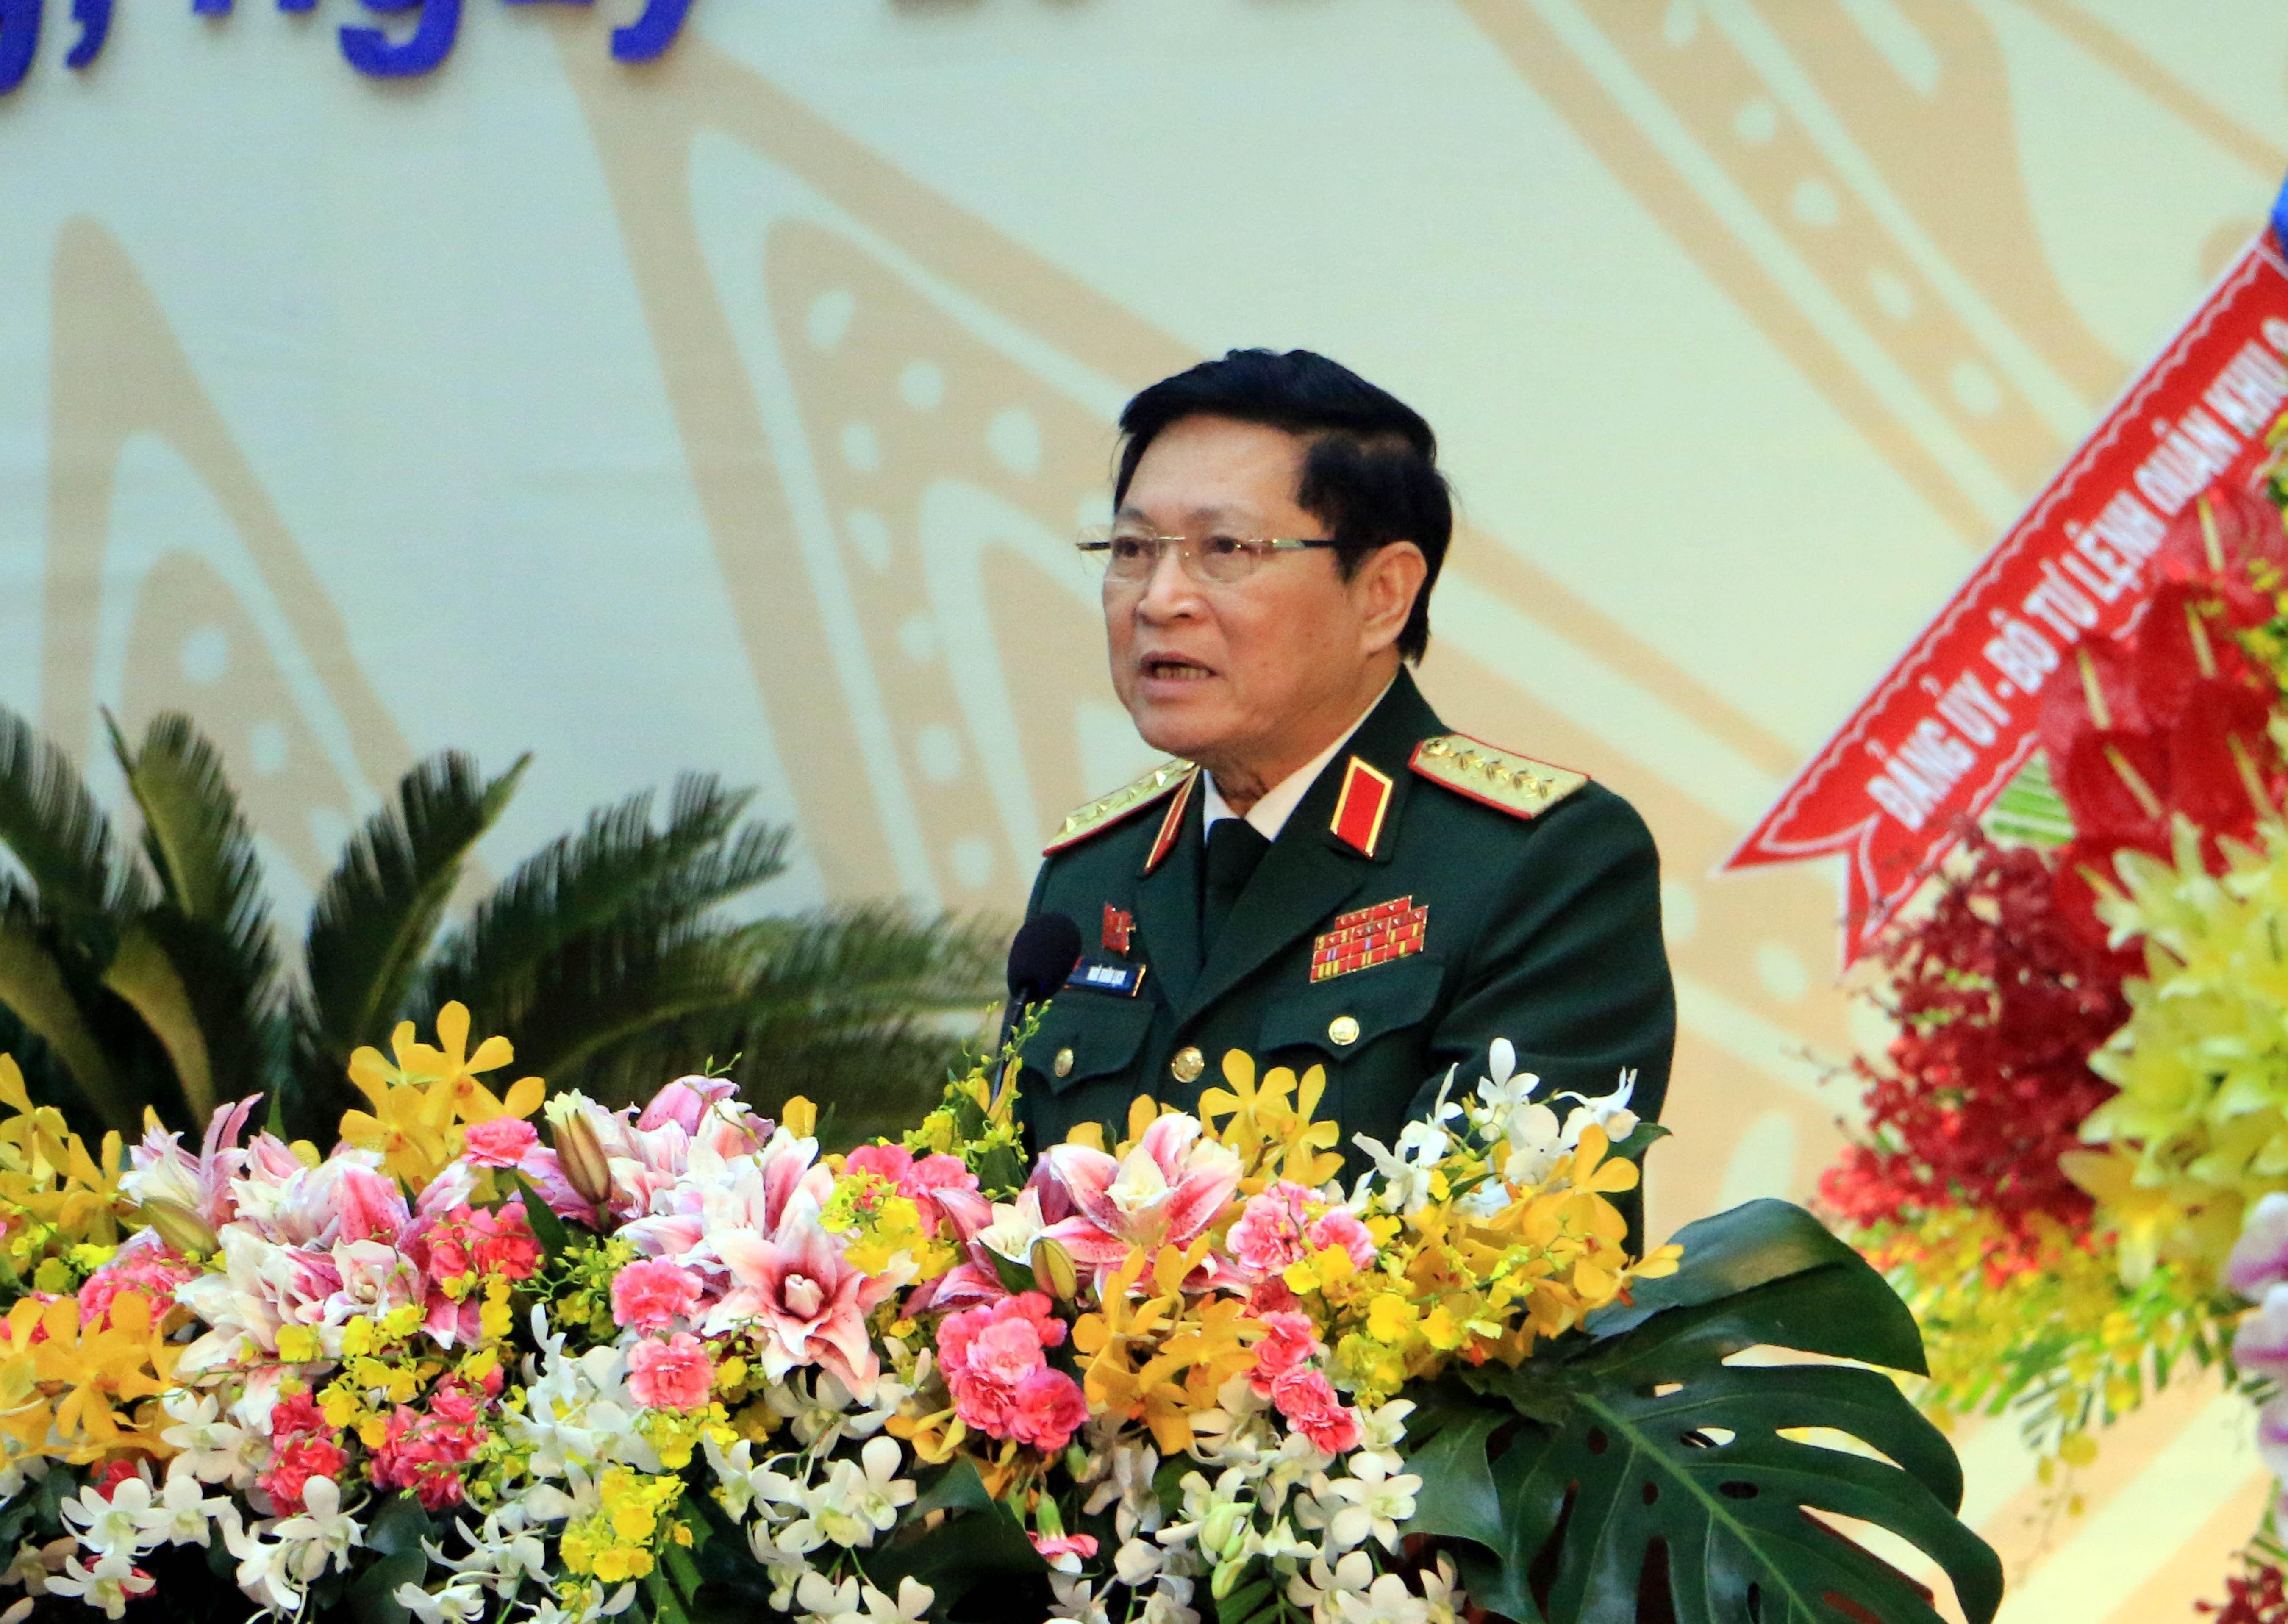 Khai mac Dai hoi Dai bieu Dang bo tinh Vinh Long nhiem ky 2020-2025 hinh anh 2